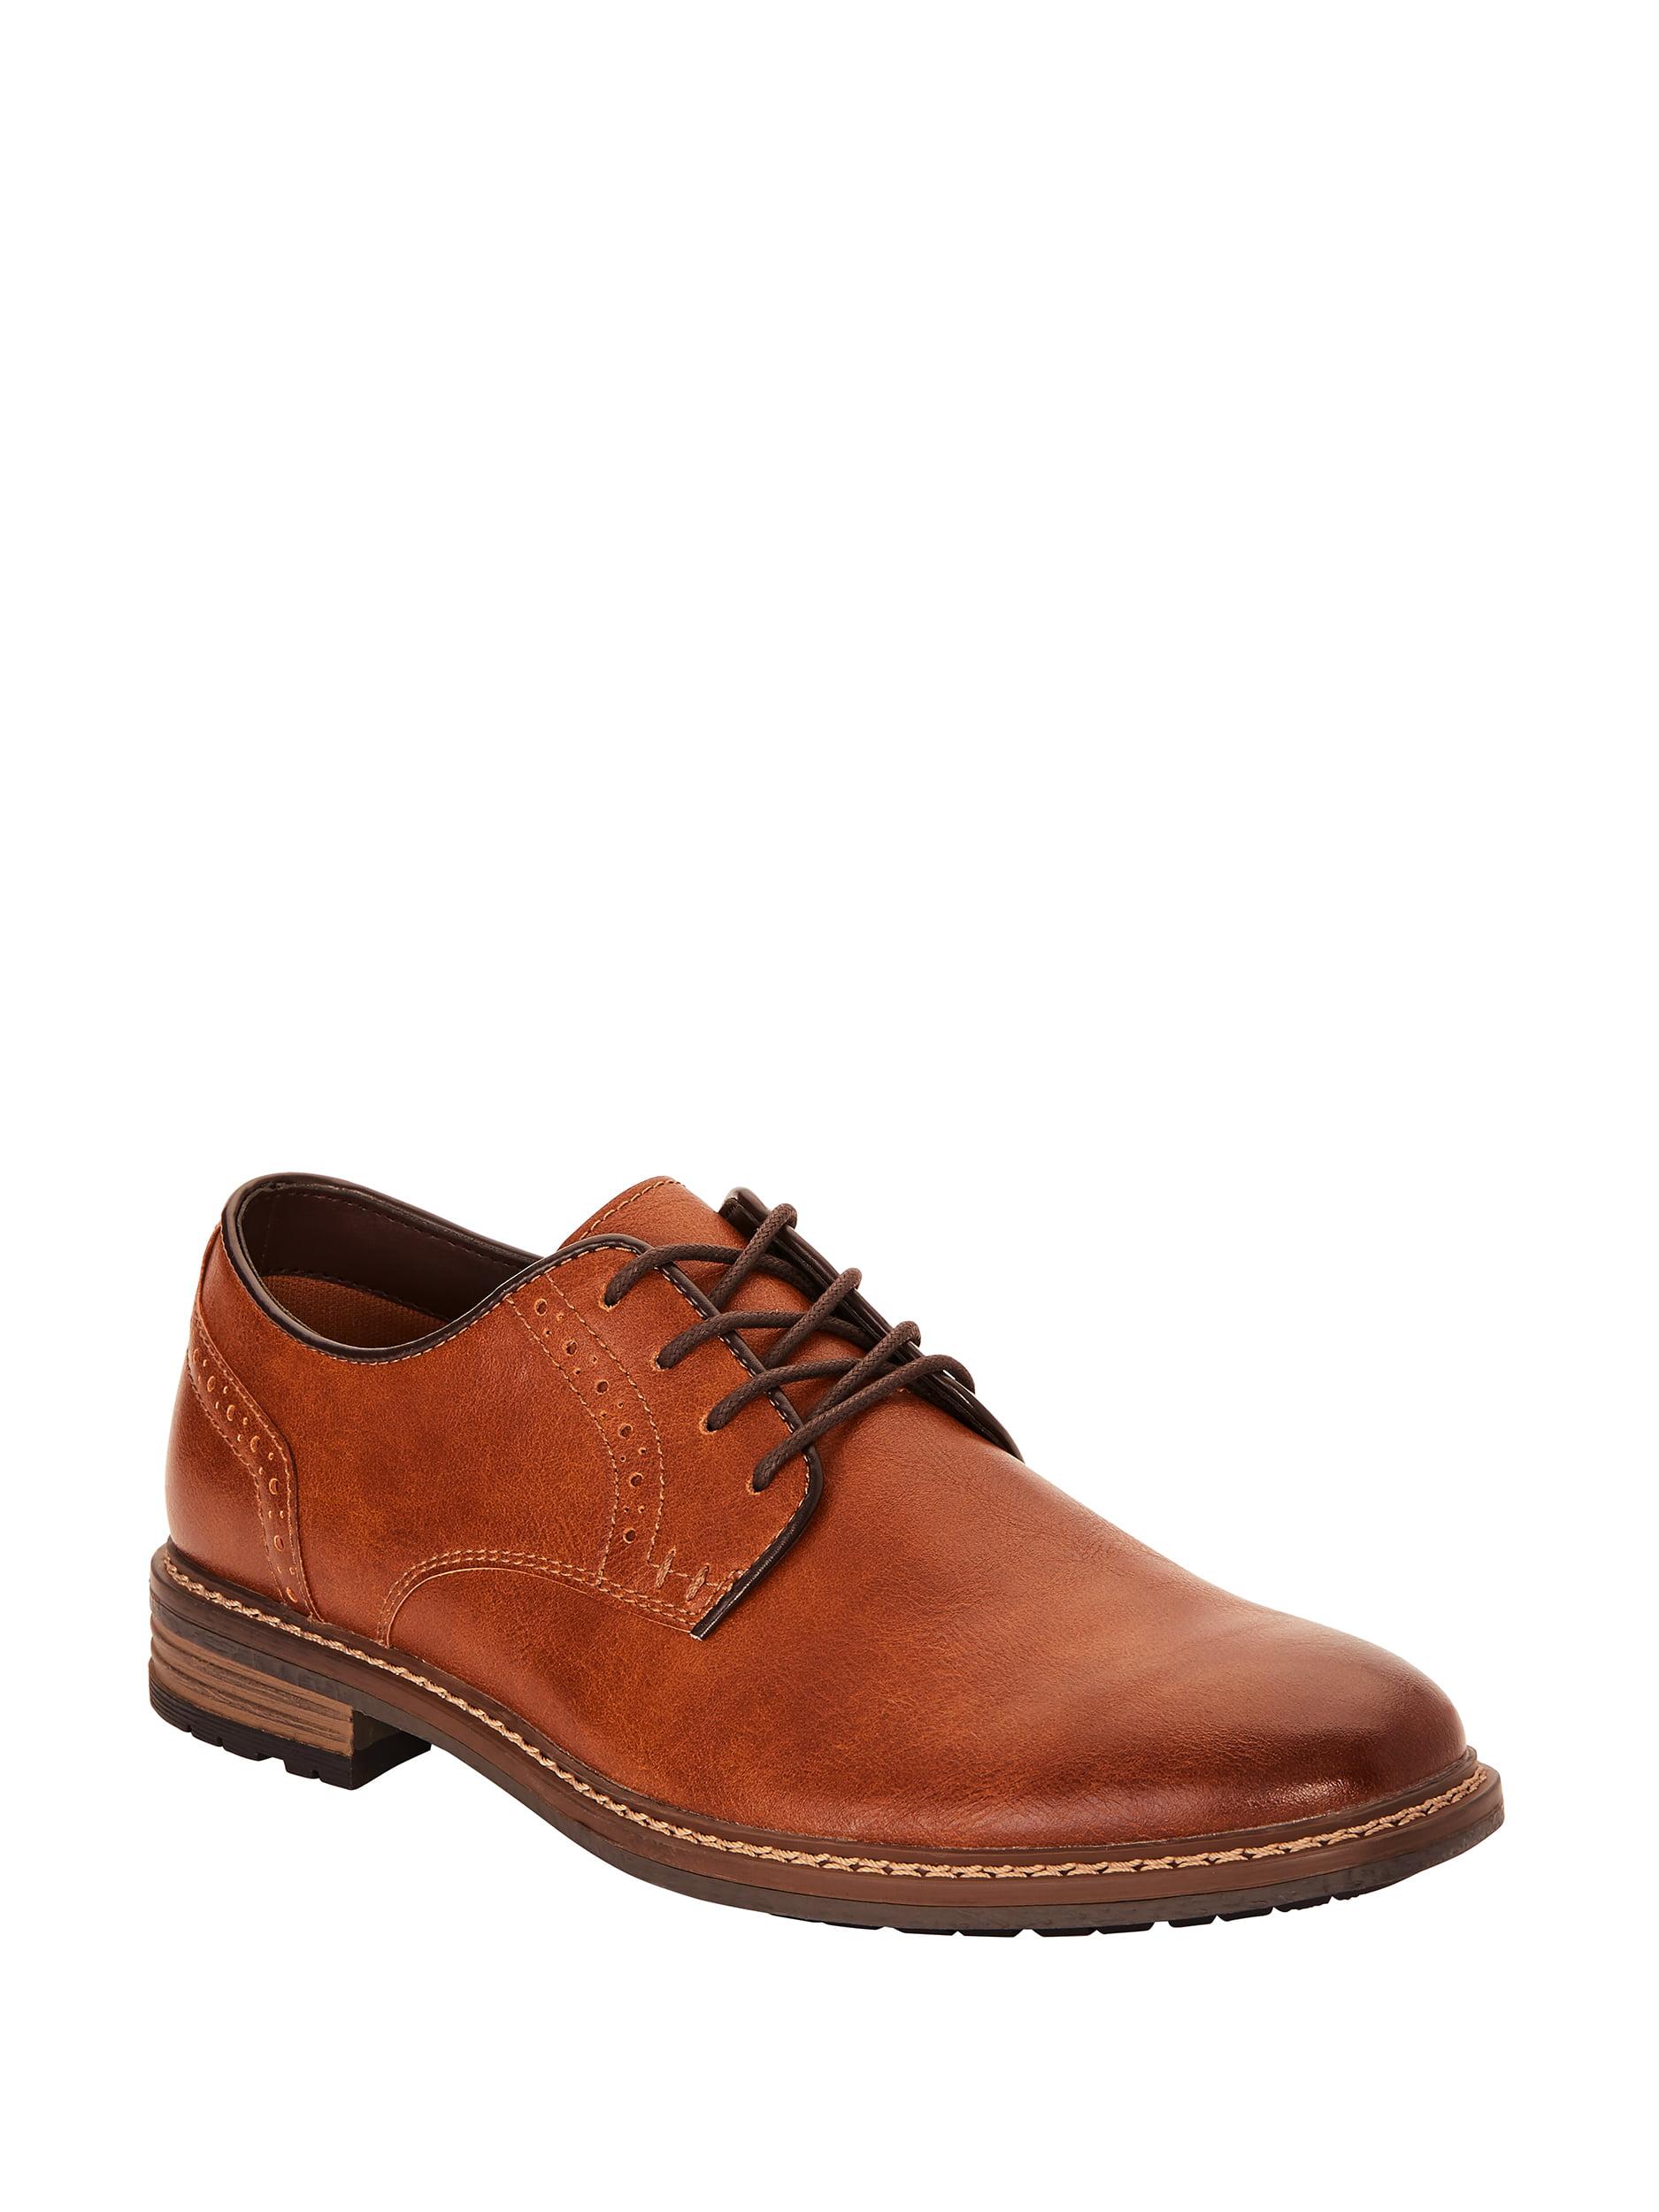 George Men's Adam Plain Toe Oxford Dress Shoe